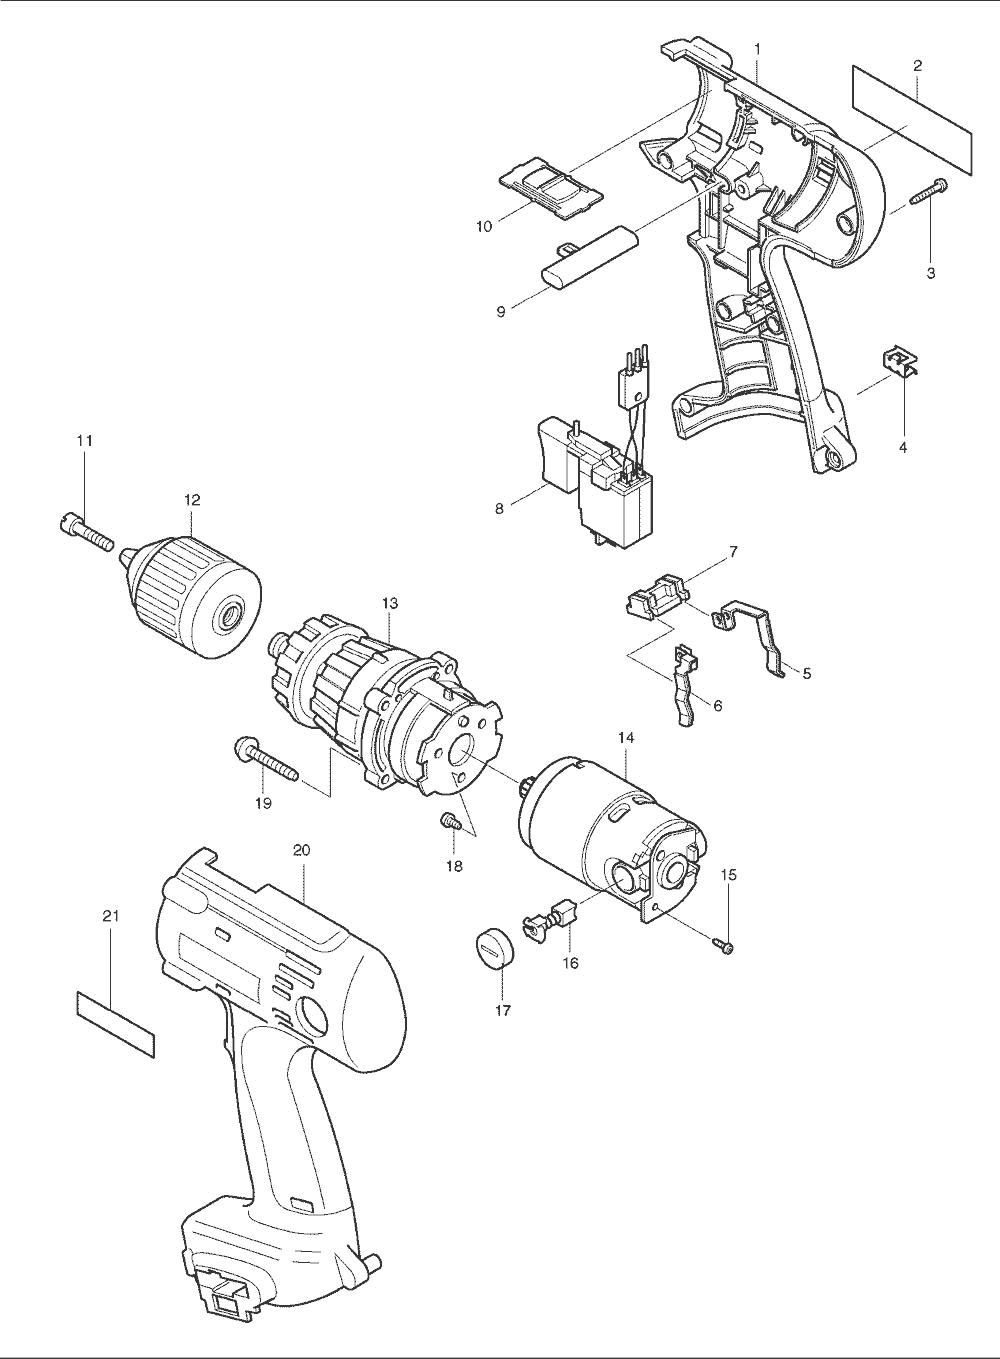 makita electric drill wiring diagram